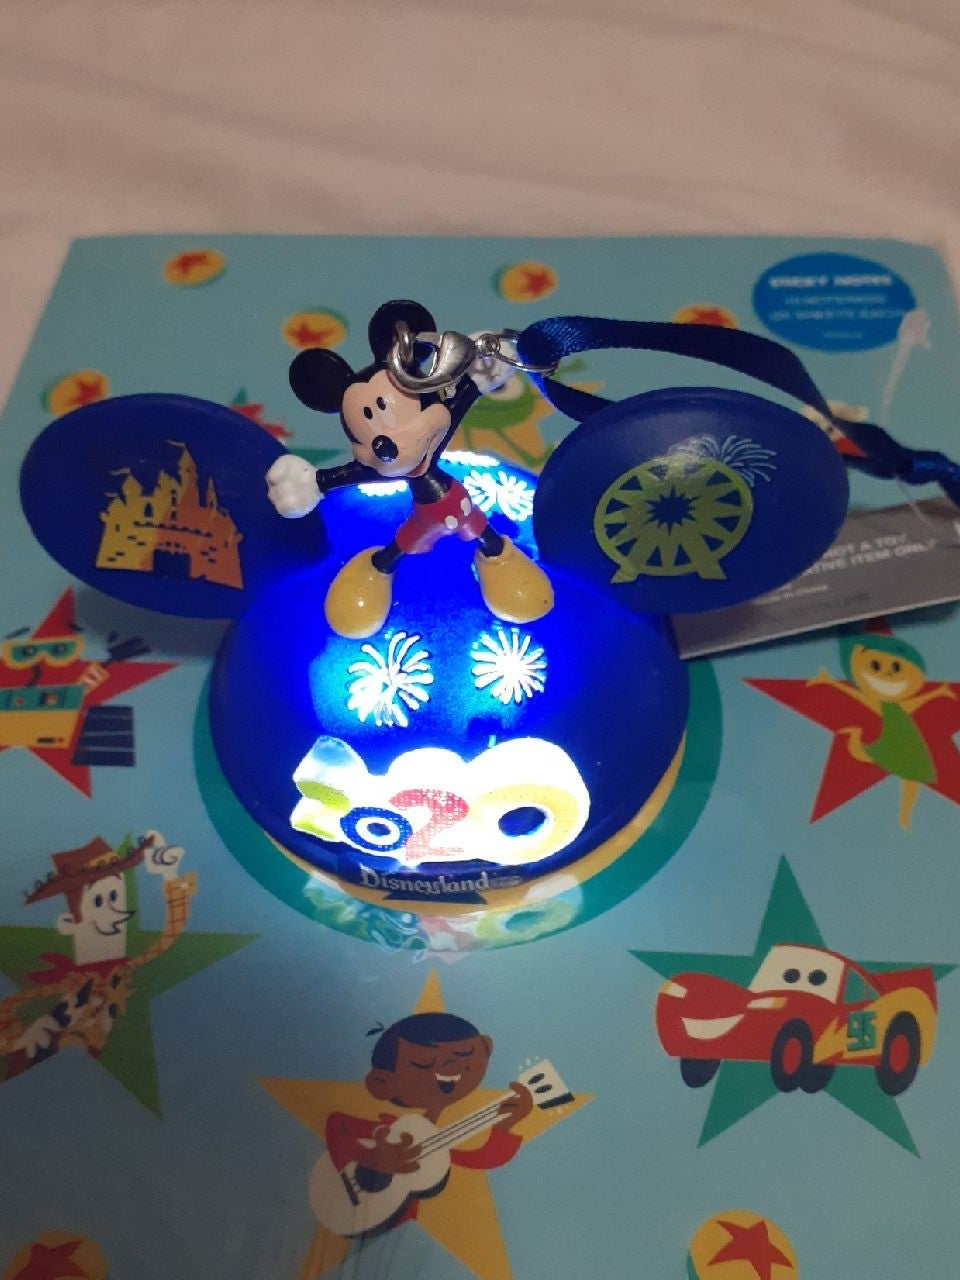 Disneyland 2020 light up hat  ornament